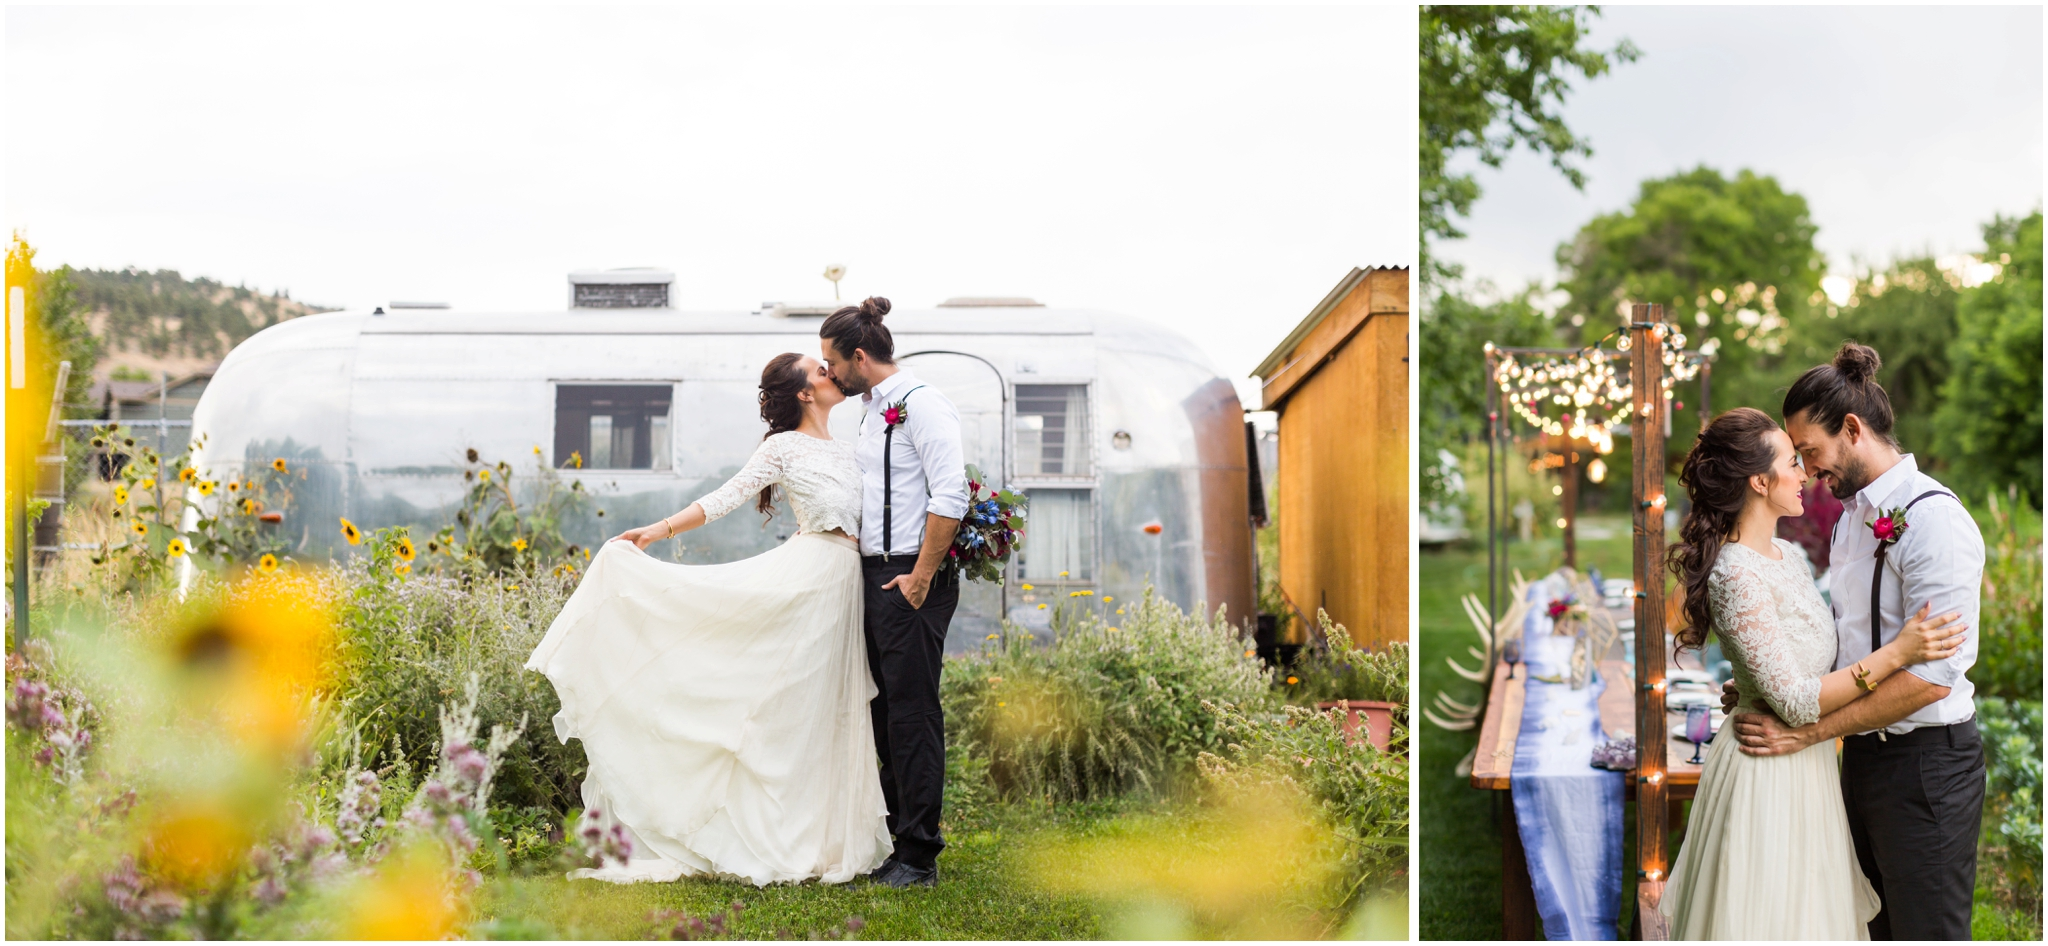 Lyons Farmette Wedding Pictures.jpg